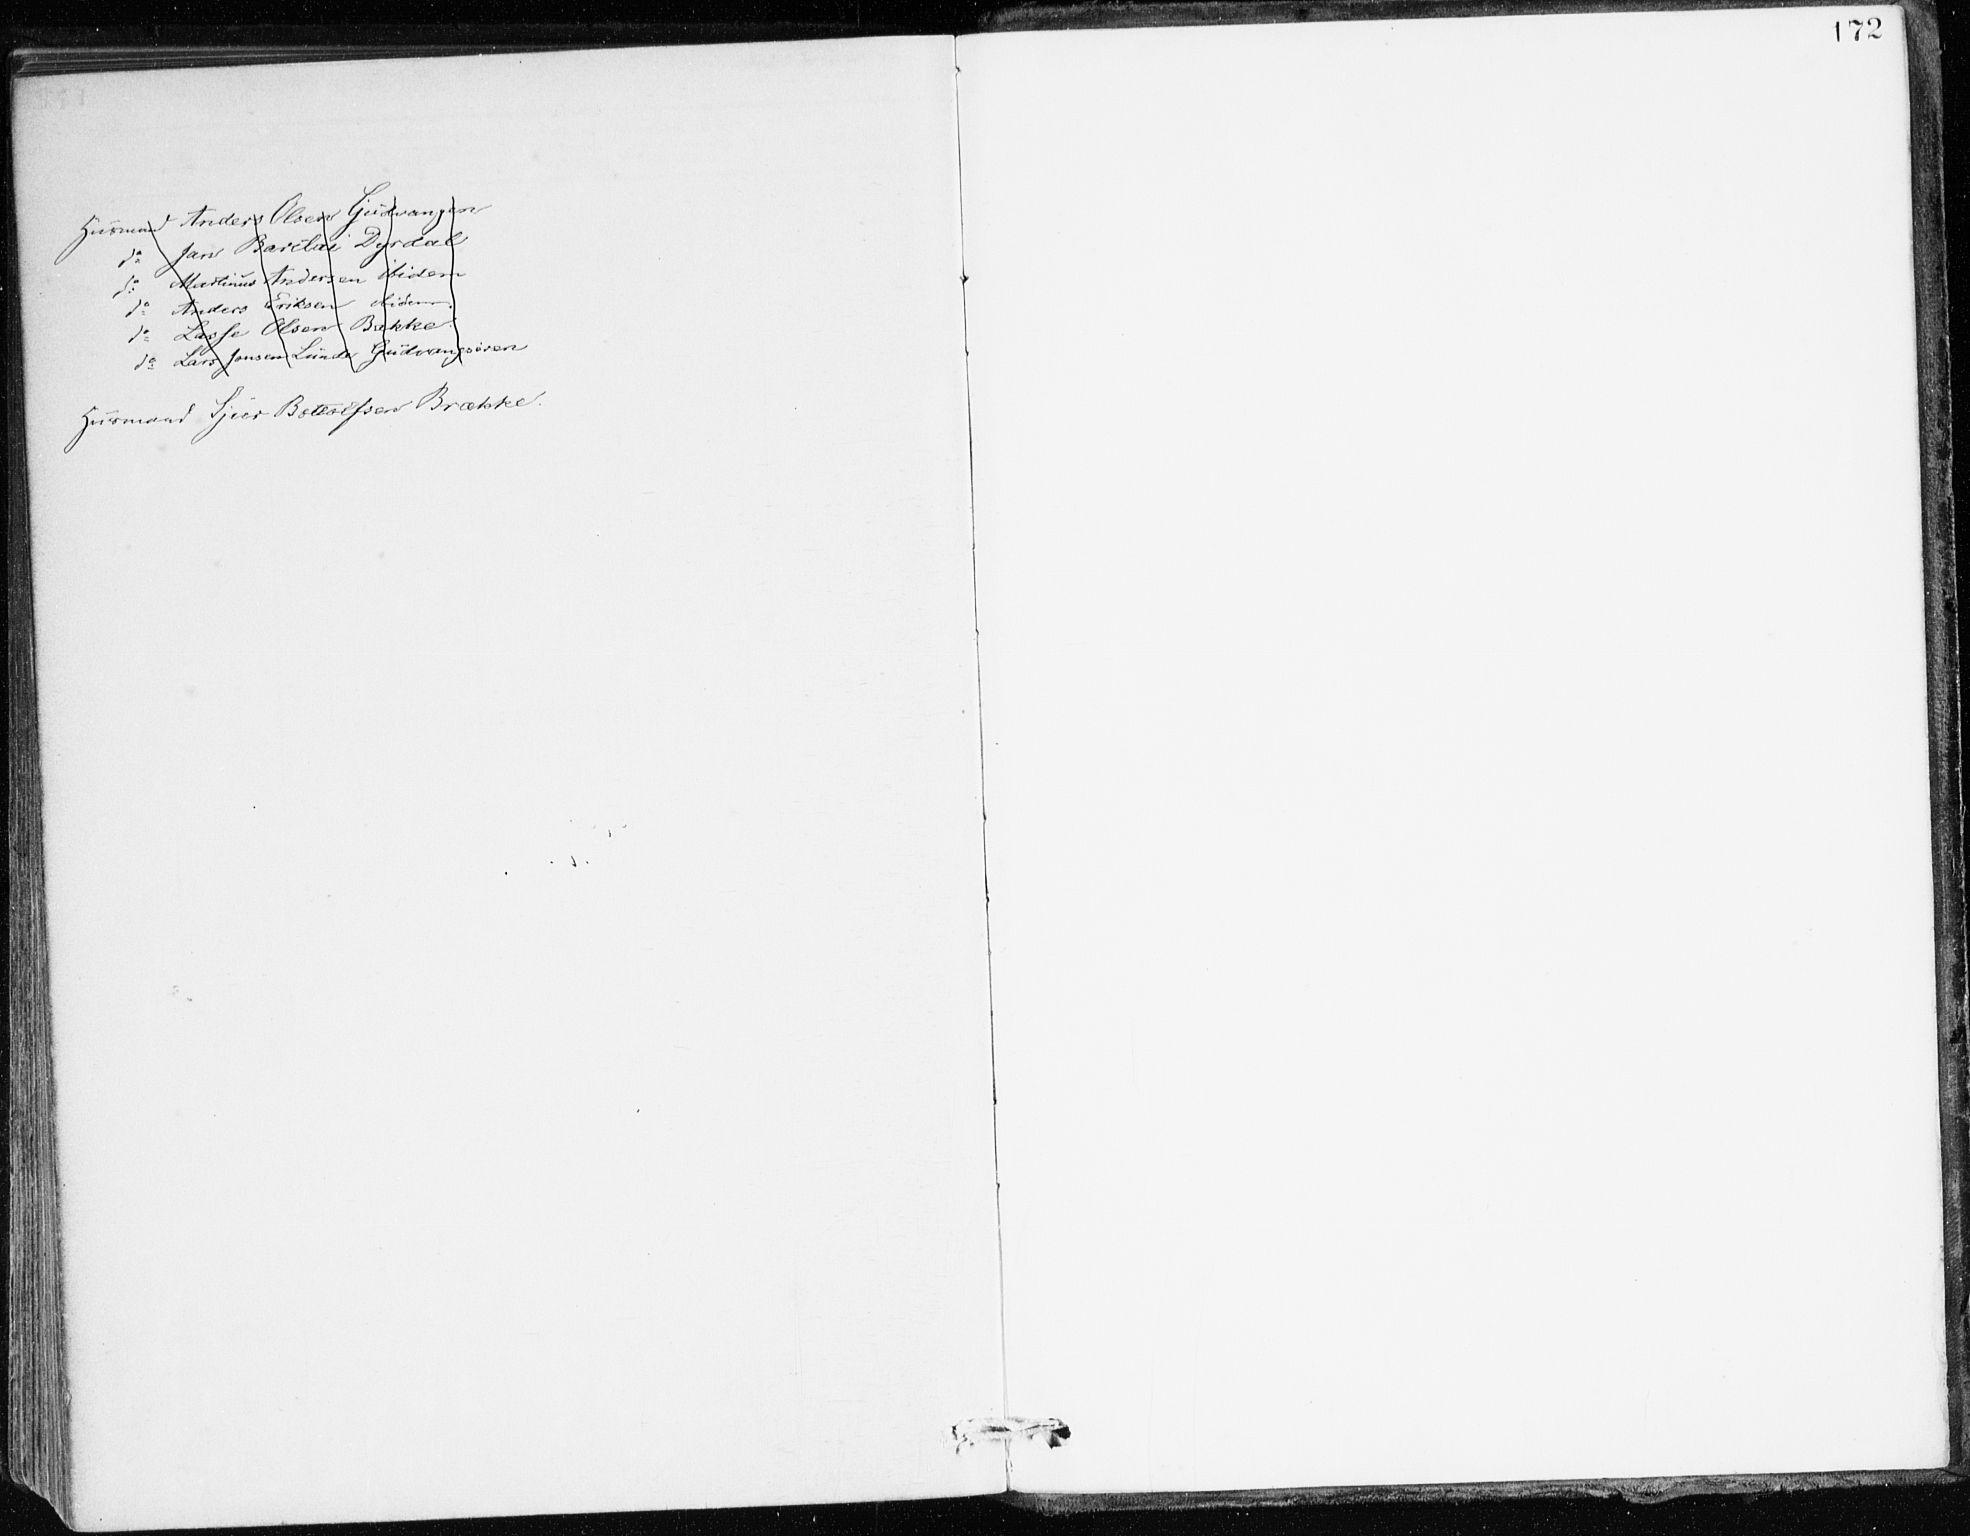 SAB, Aurland Sokneprestembete*, Ministerialbok nr. C 1, 1880-1921, s. 172